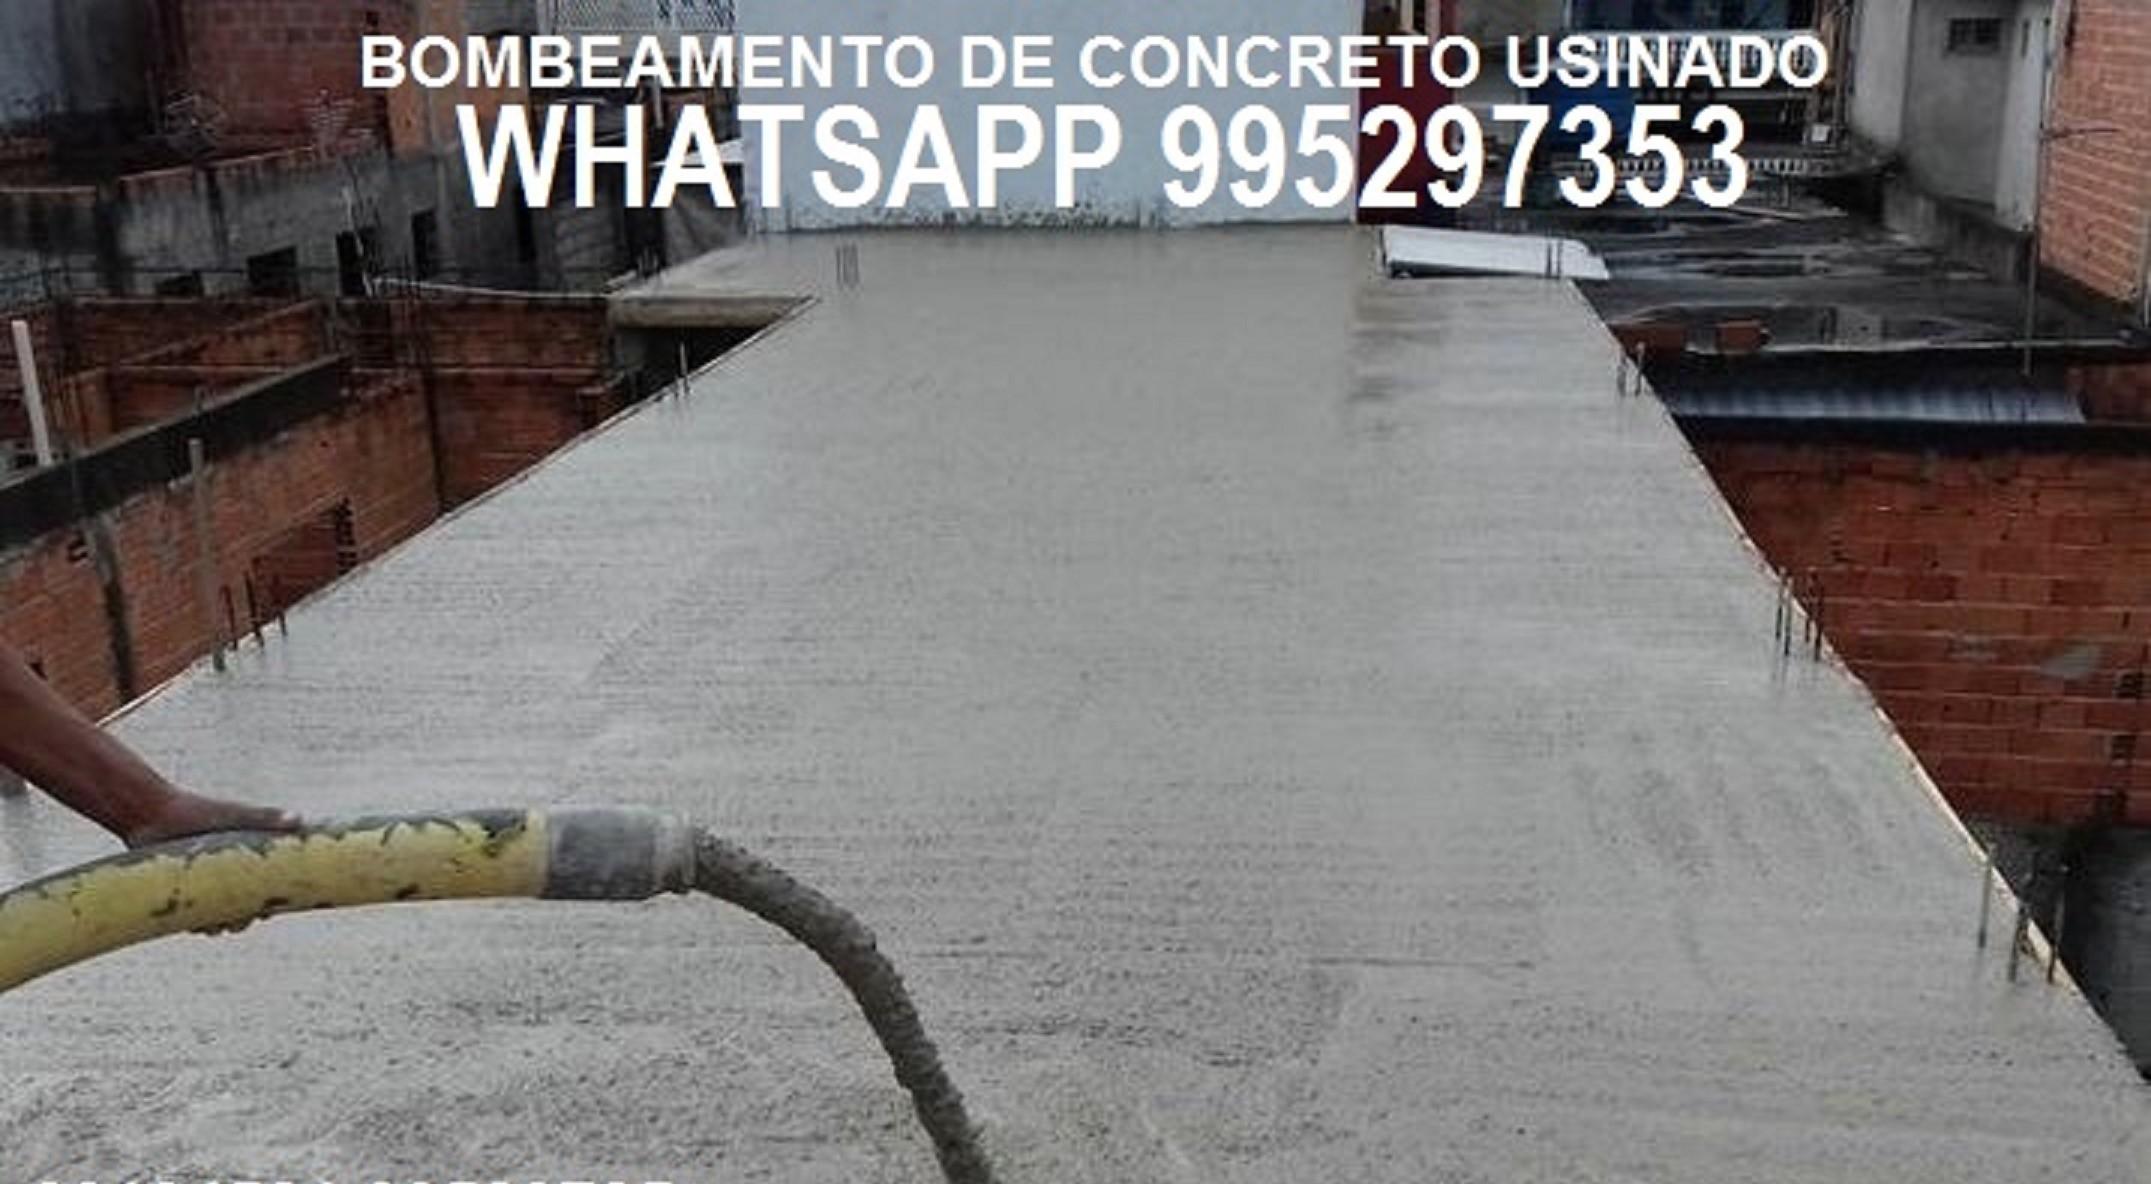 Concreto Bombeado Guaratiba Sepetiba Campo Grande Santa Cruz Realengo